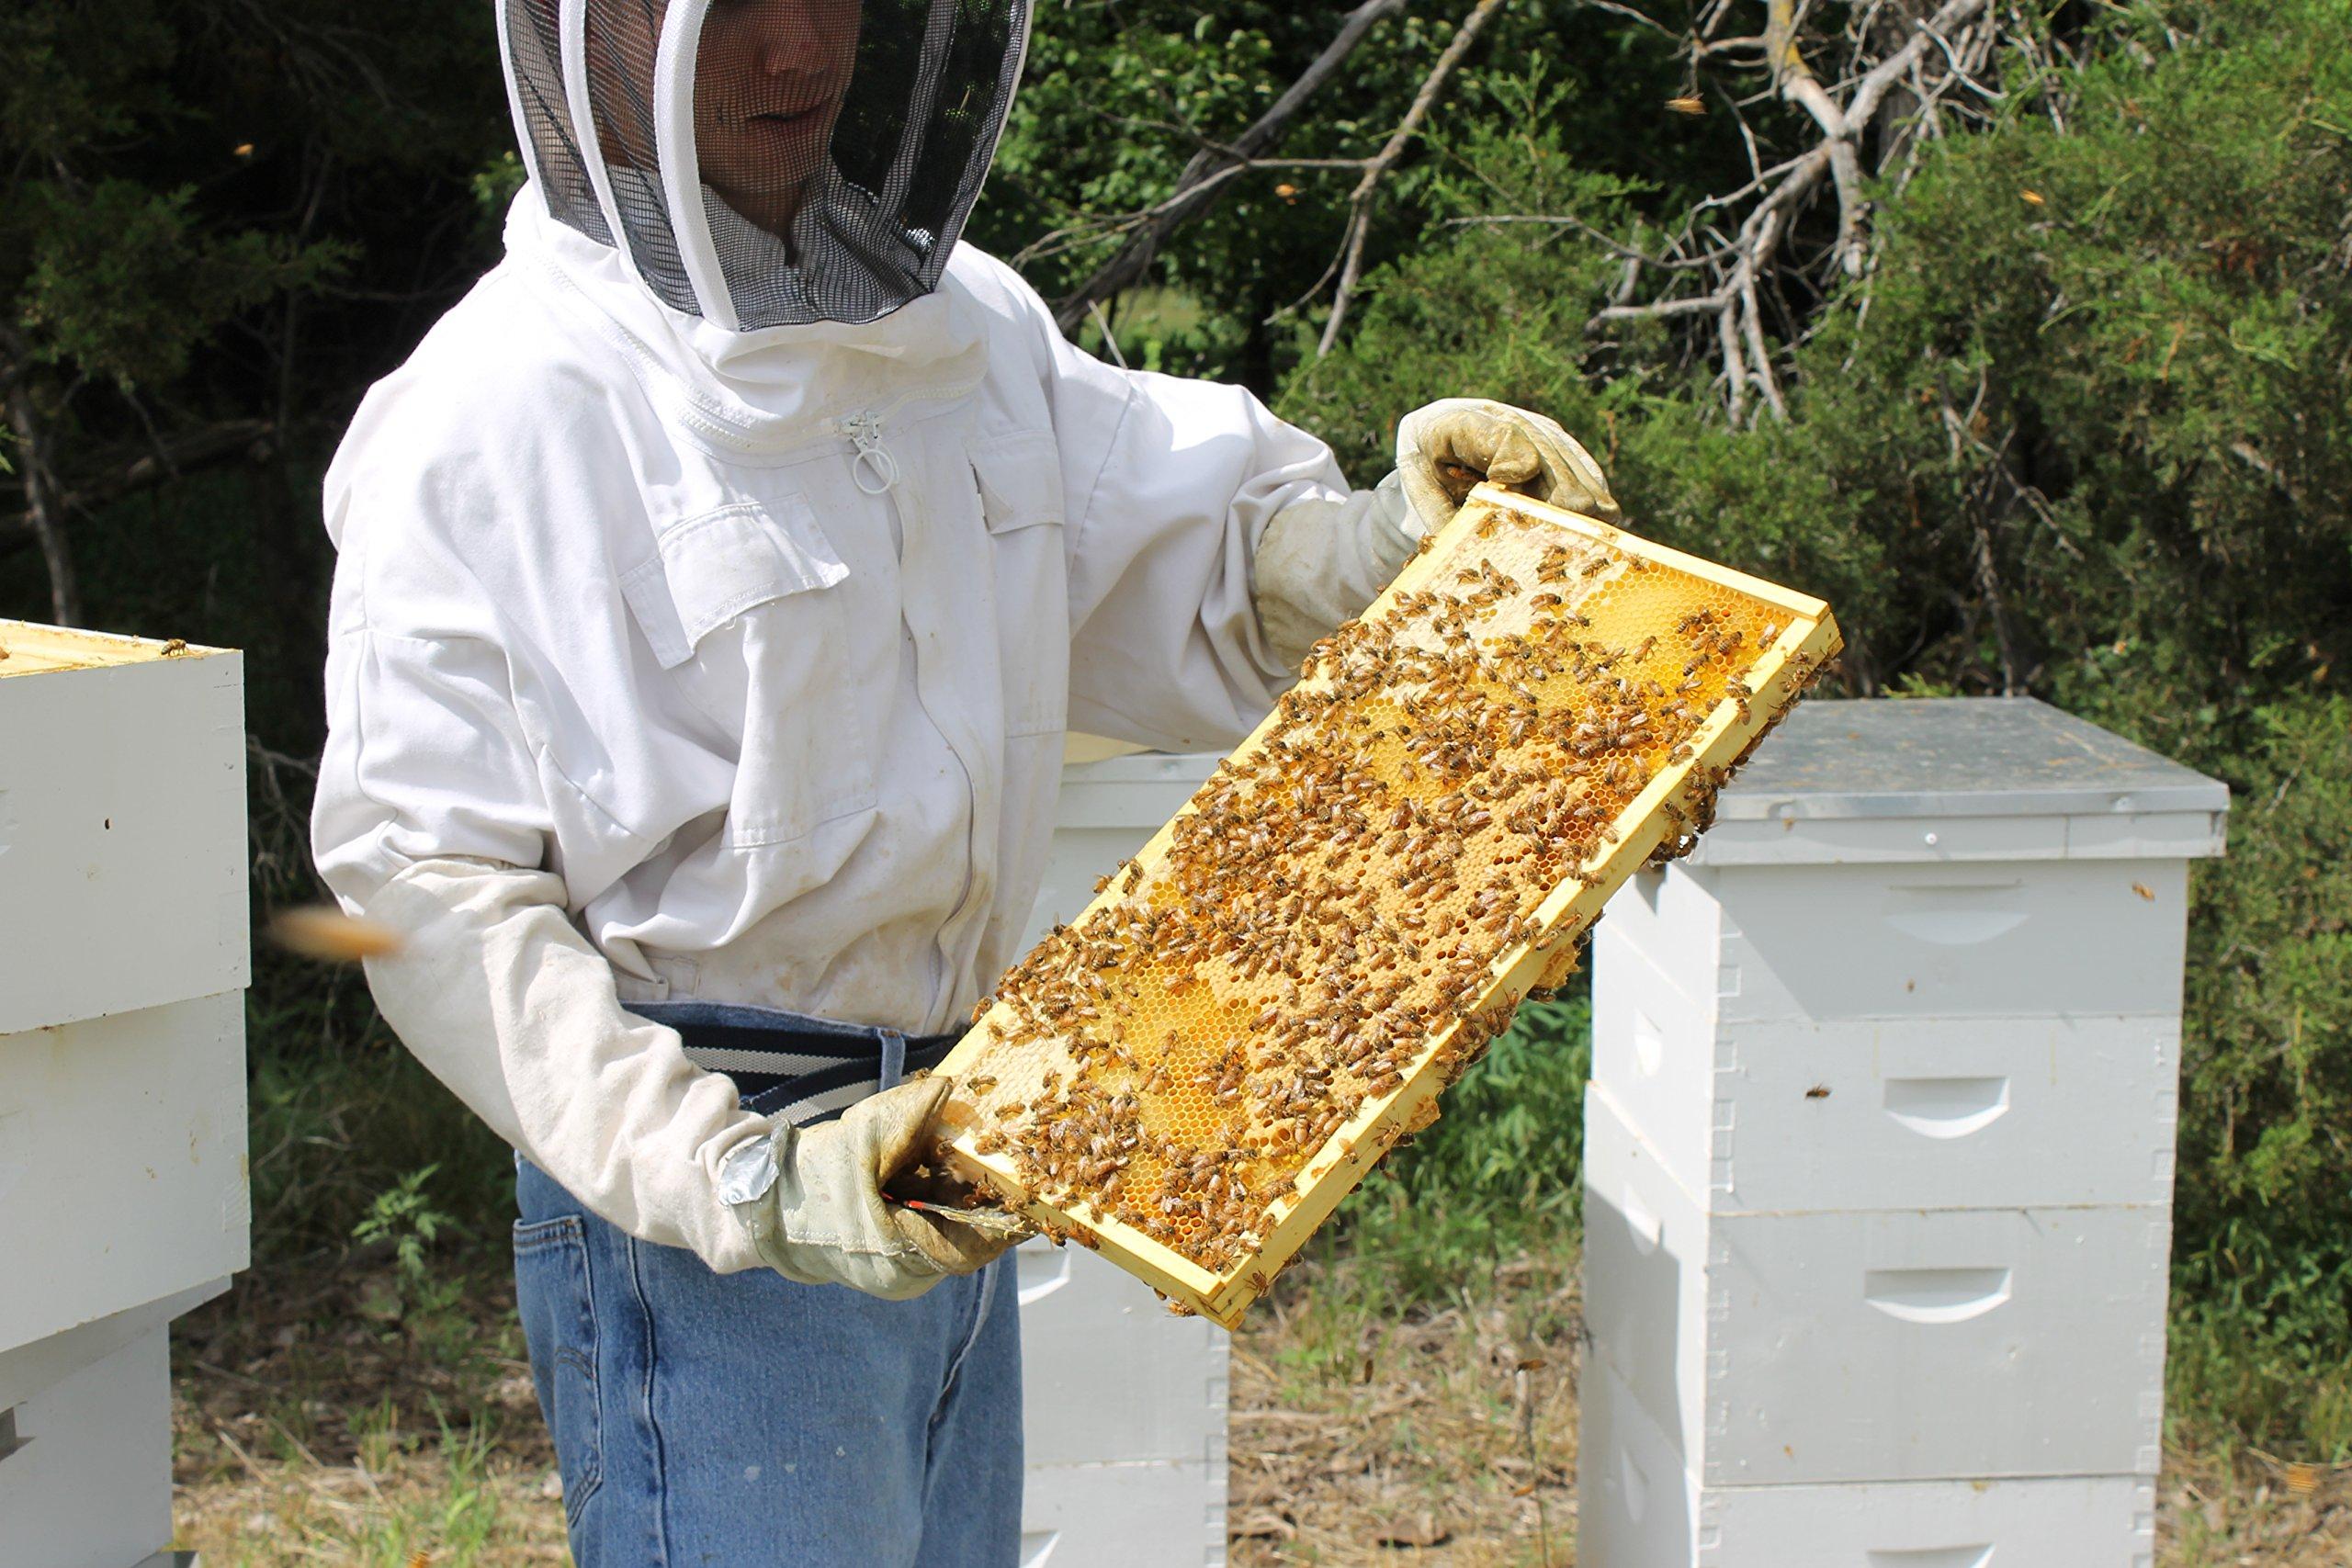 Raw Honey Pure Natural Nebraska Honey One 2lb Jar by Prairie River Honey Farm (Image #7)